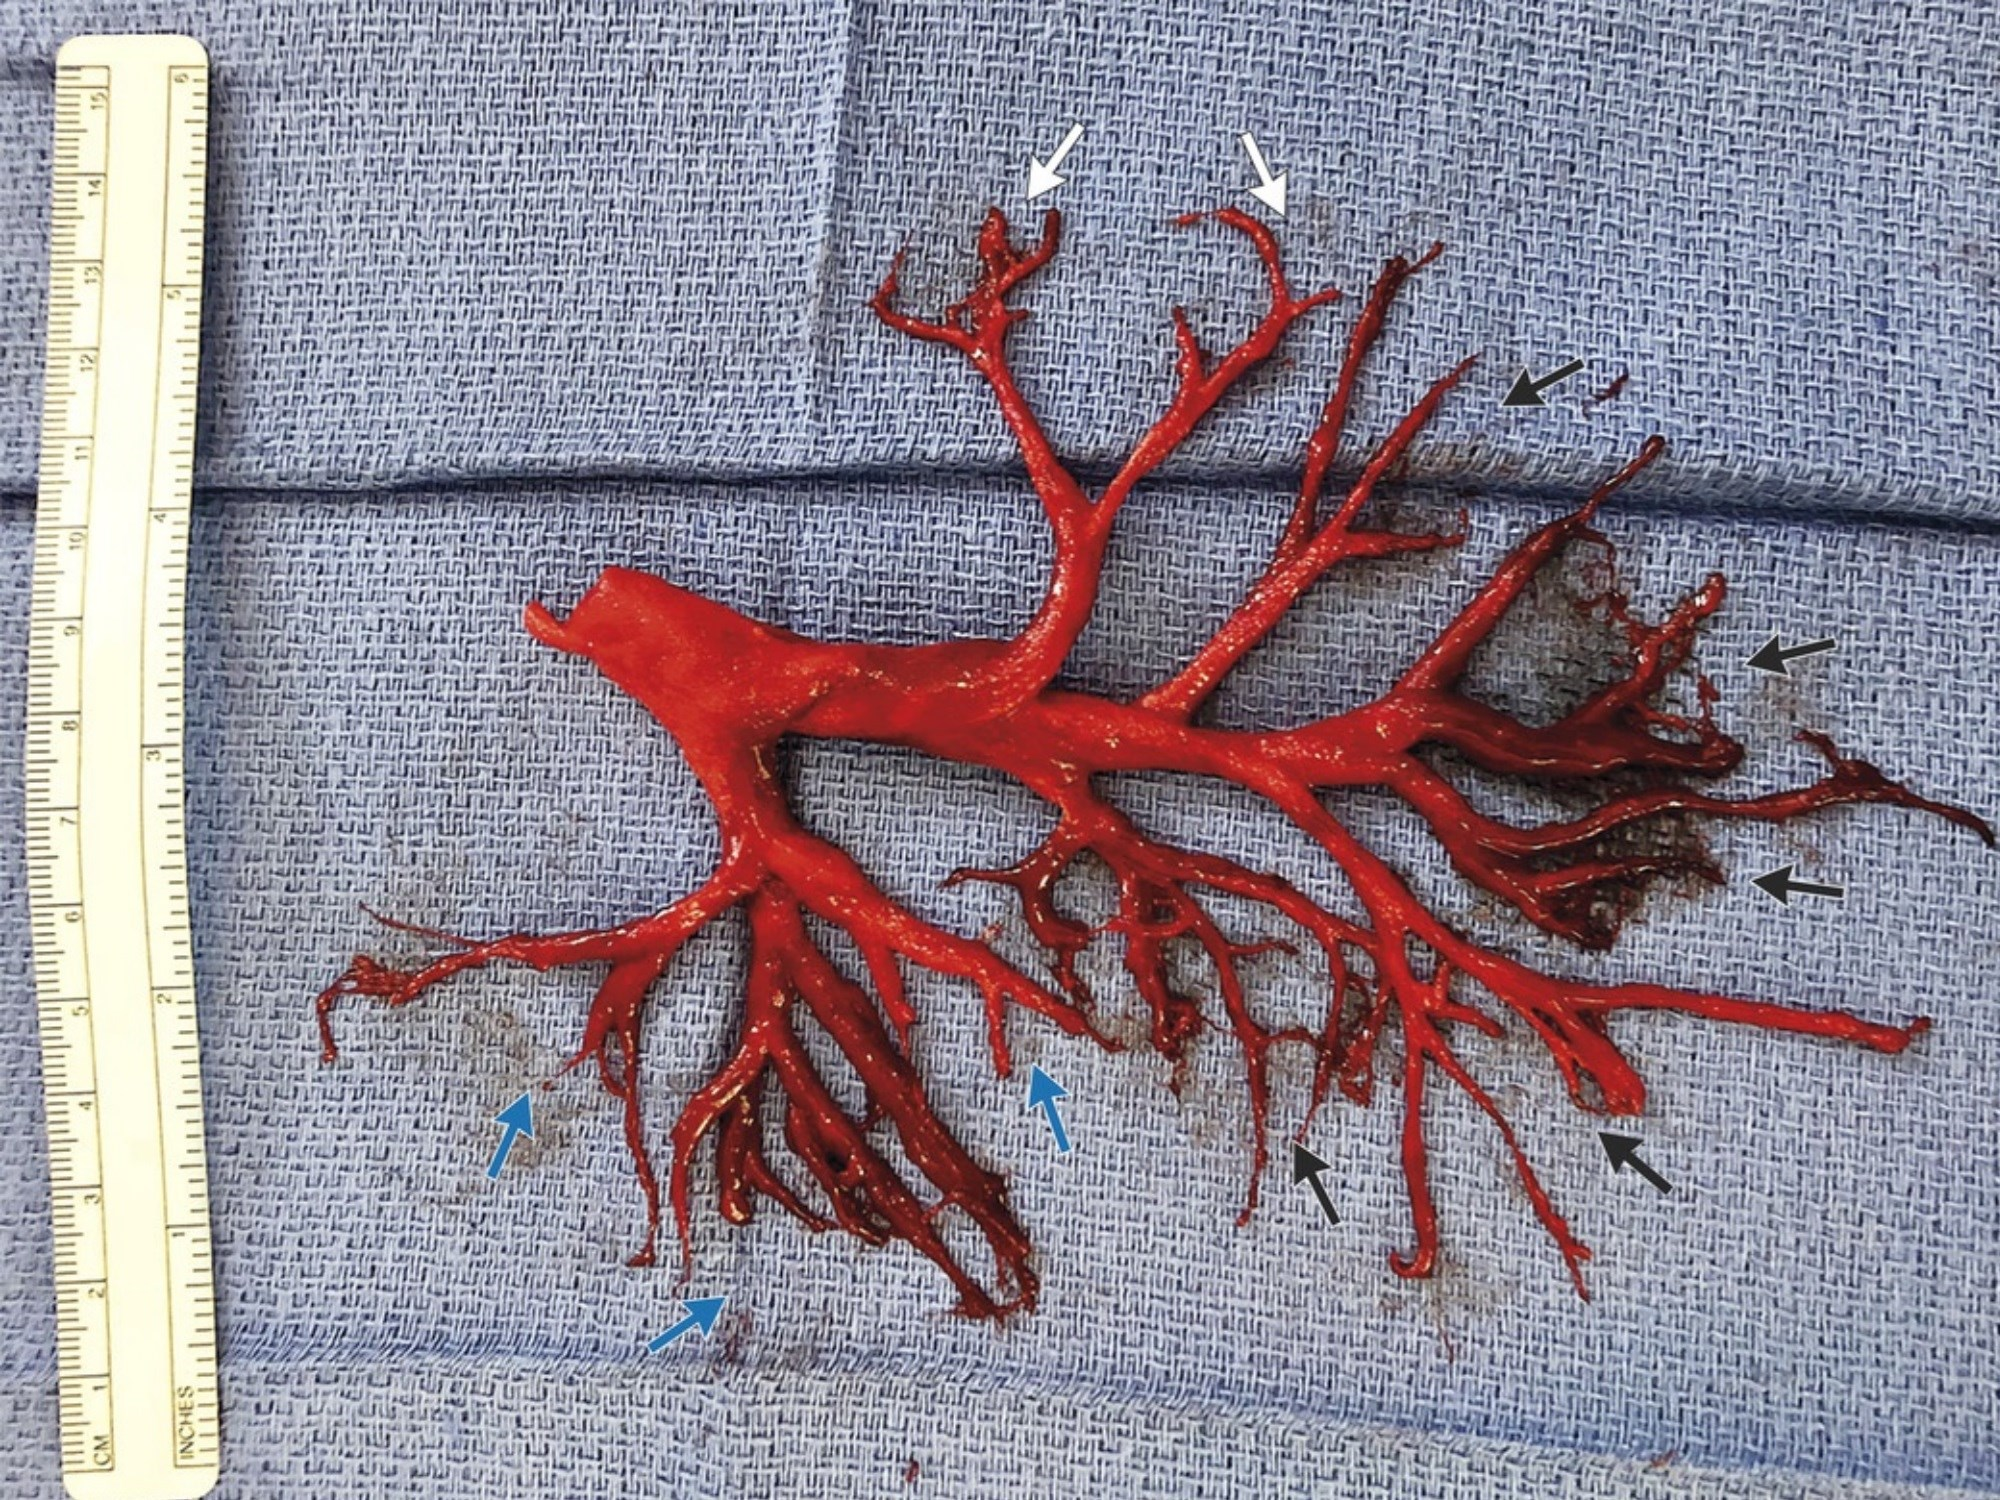 Heart Failure Patient Coughs Up Bronchial Tree-Shaped Blood Clot